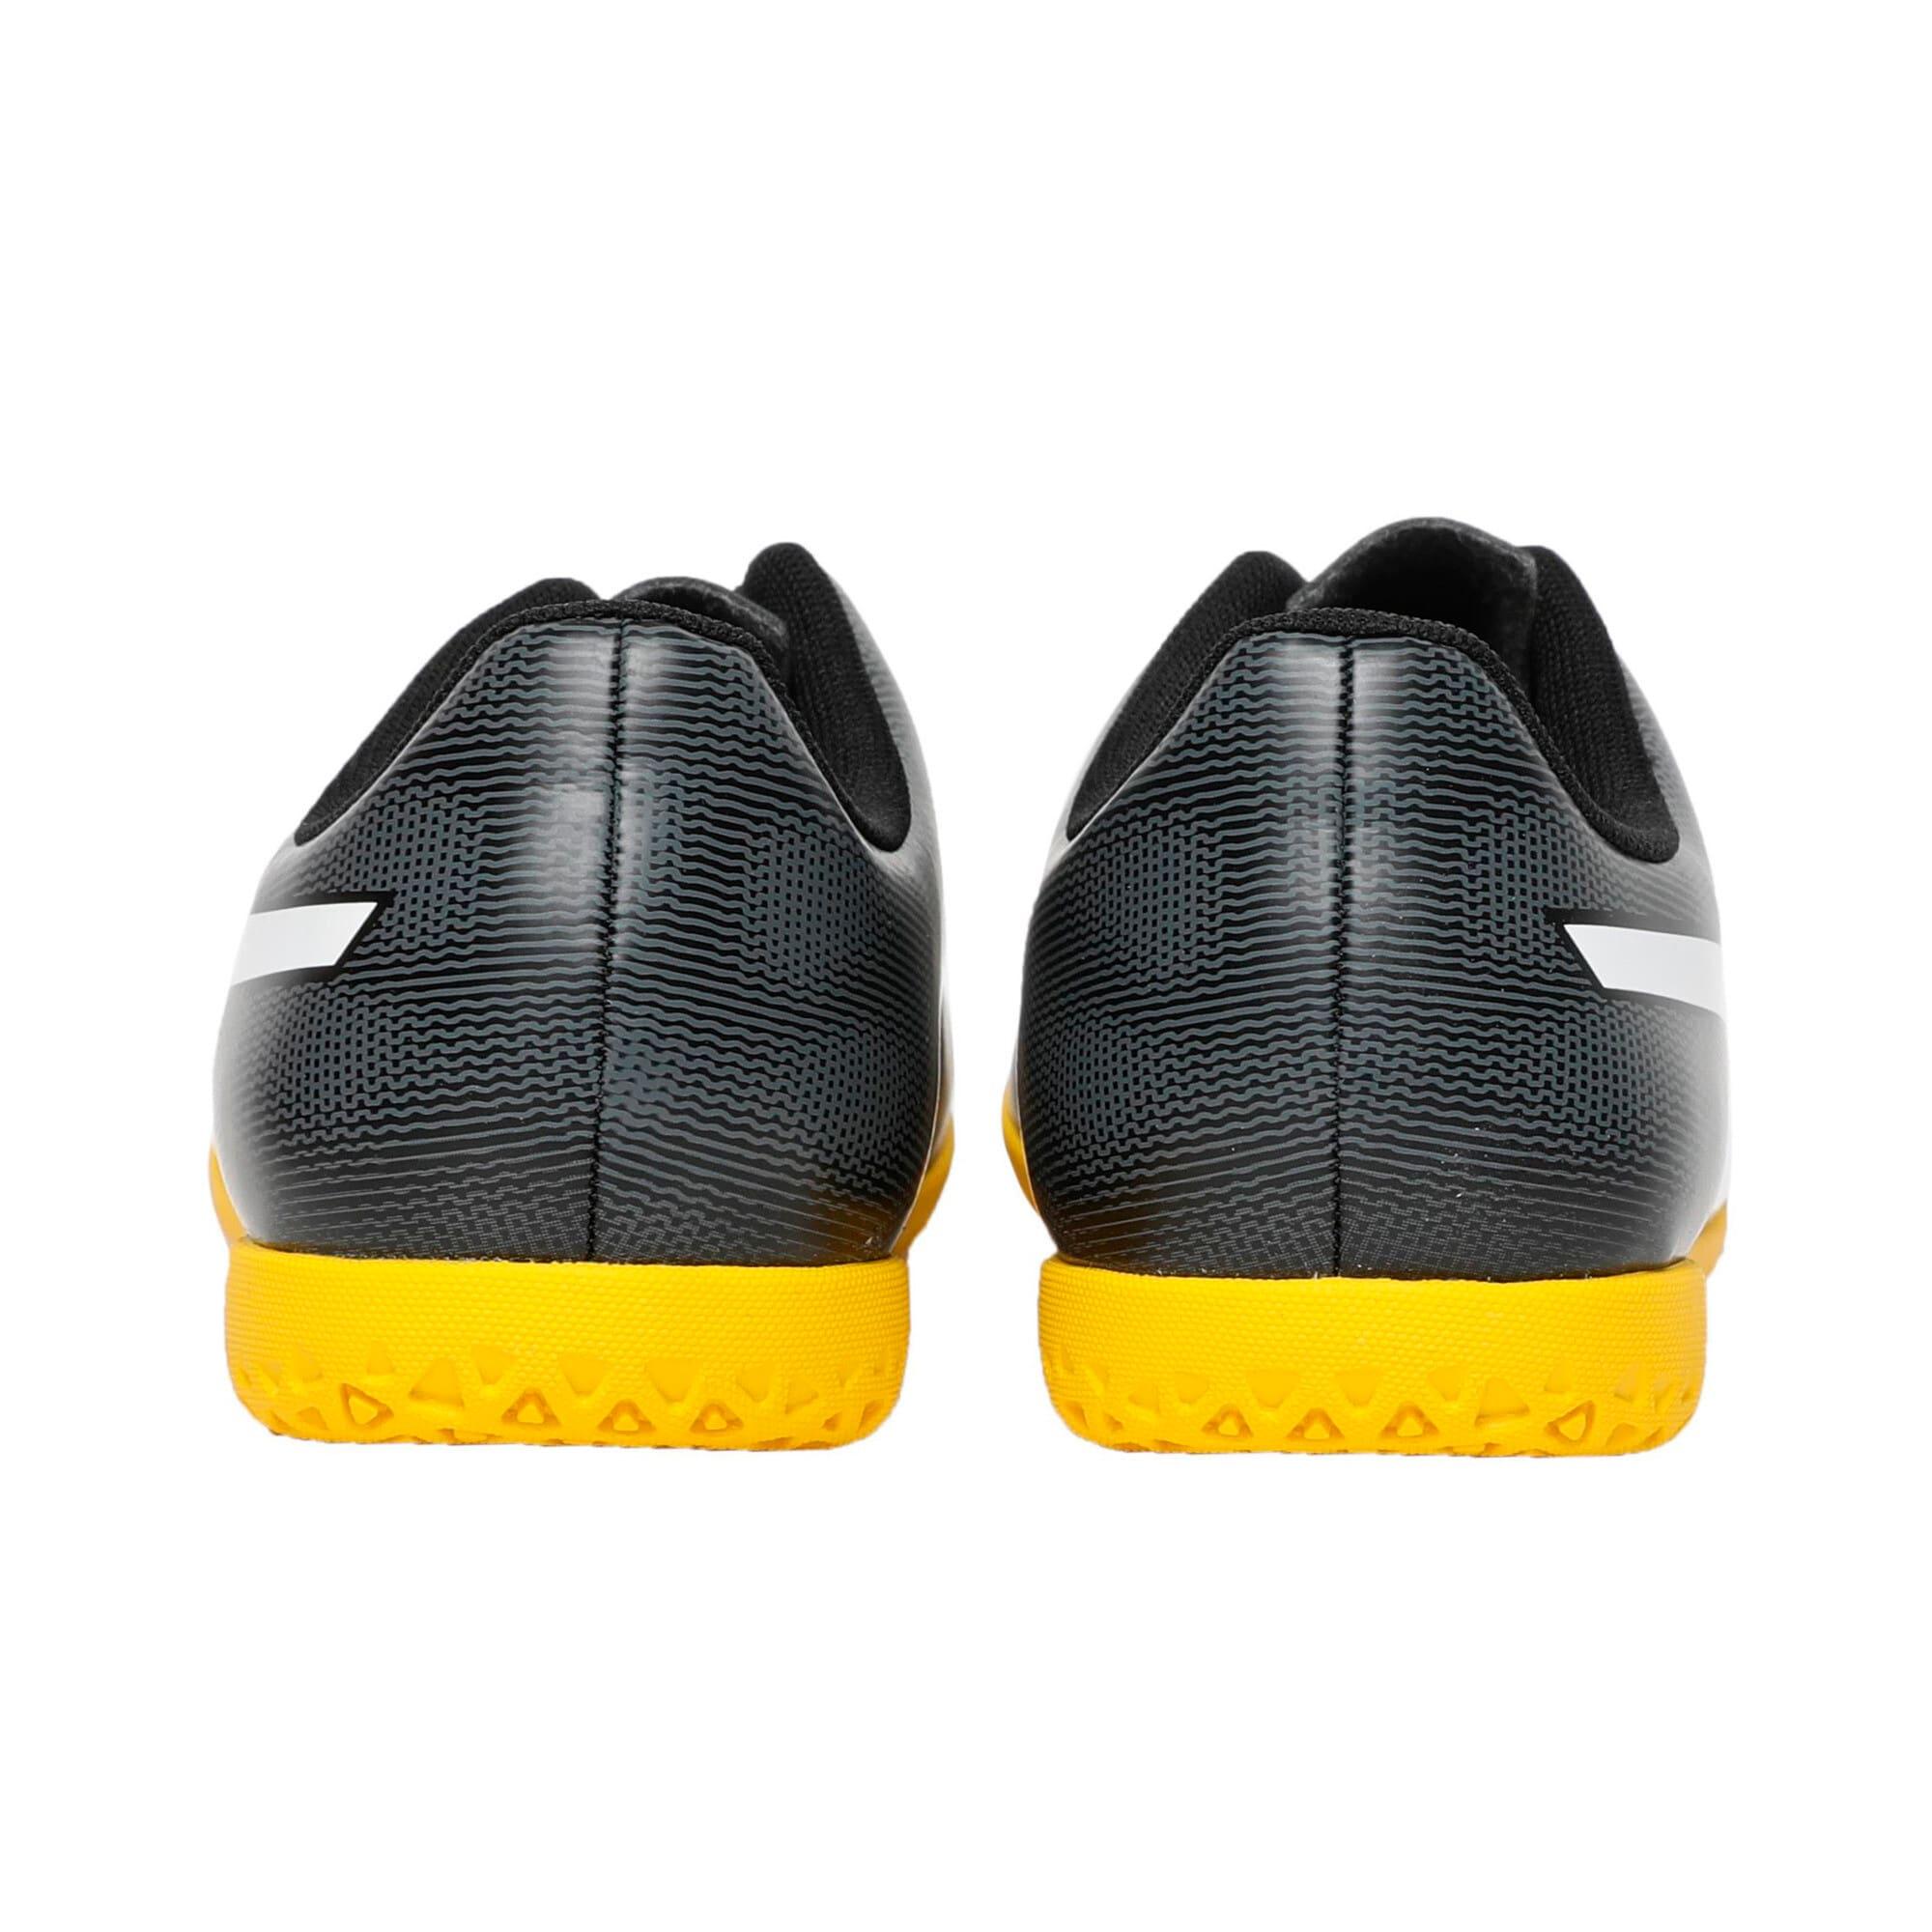 Thumbnail 3 of Rapido IT Youth Football Boots, Black-White-Iron-Yellow, medium-IND